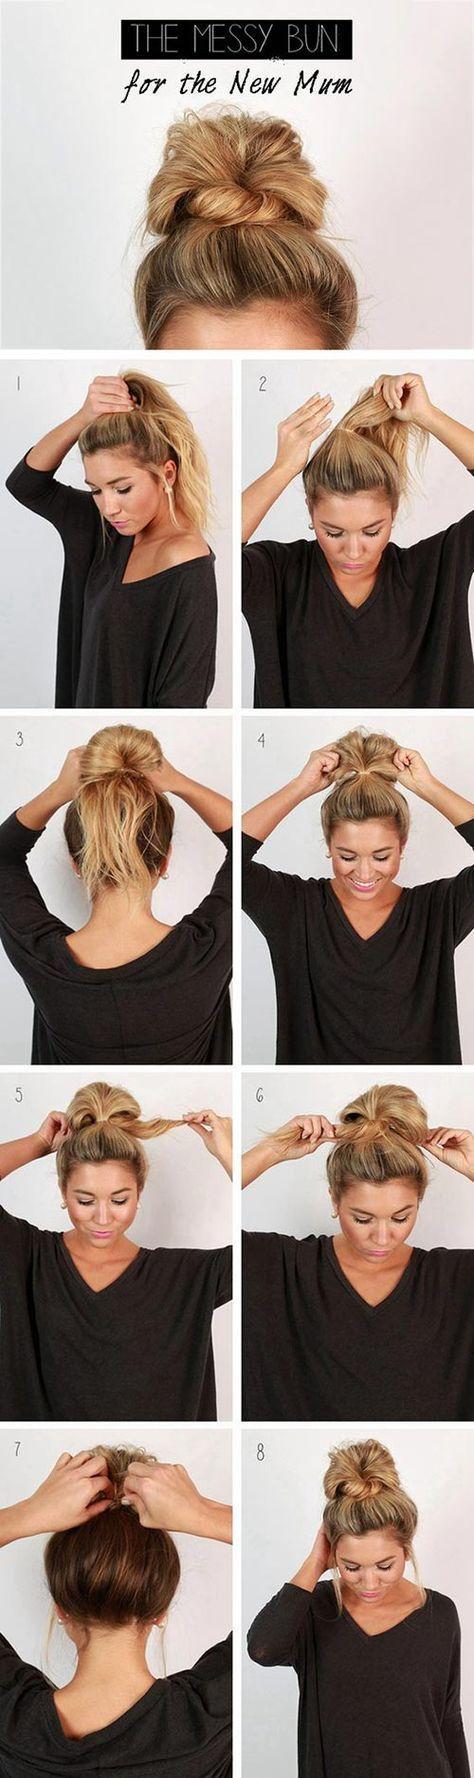 Photo of Top 10 Messy Updo Tutorials für verschiedene Haarlängen